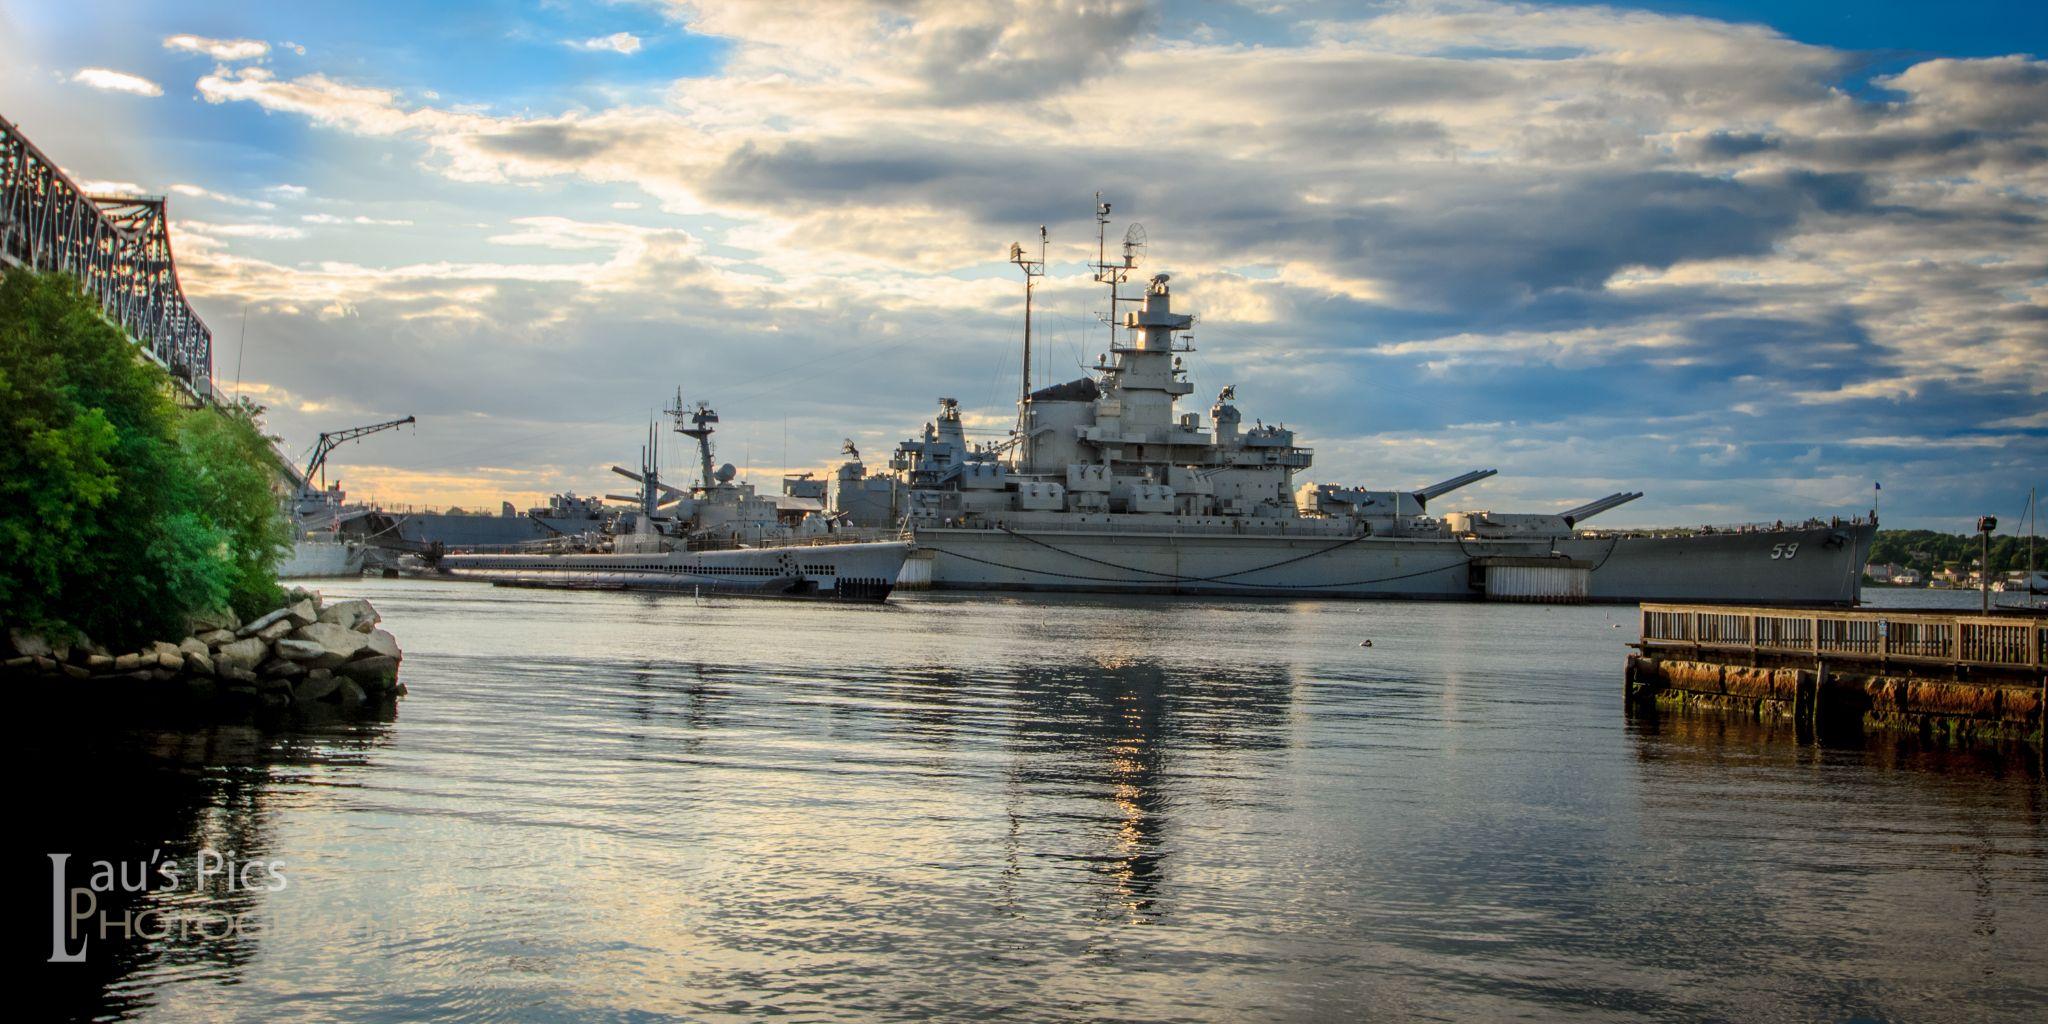 Battleship Cove DSC_0880 by lauspics